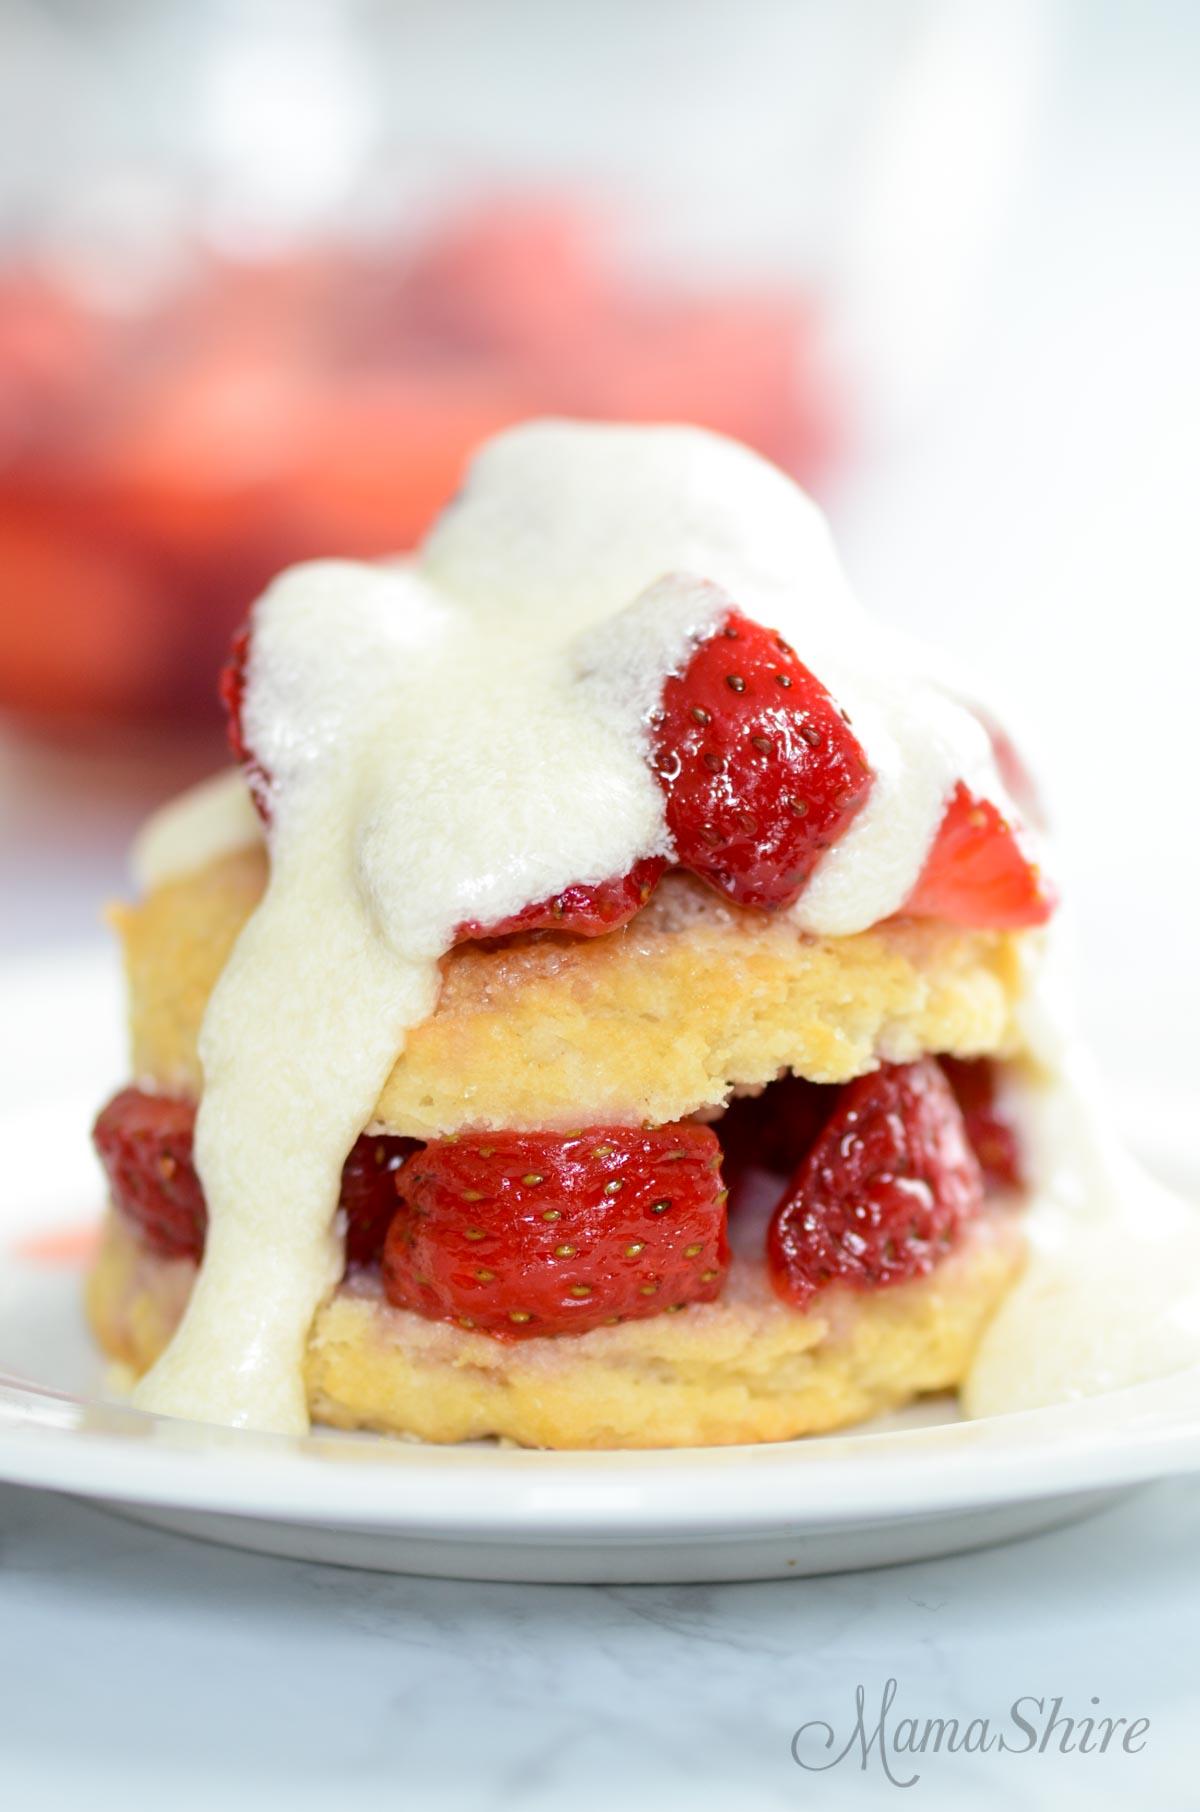 Strawberry shortcake (gluten-free & dairy-free)